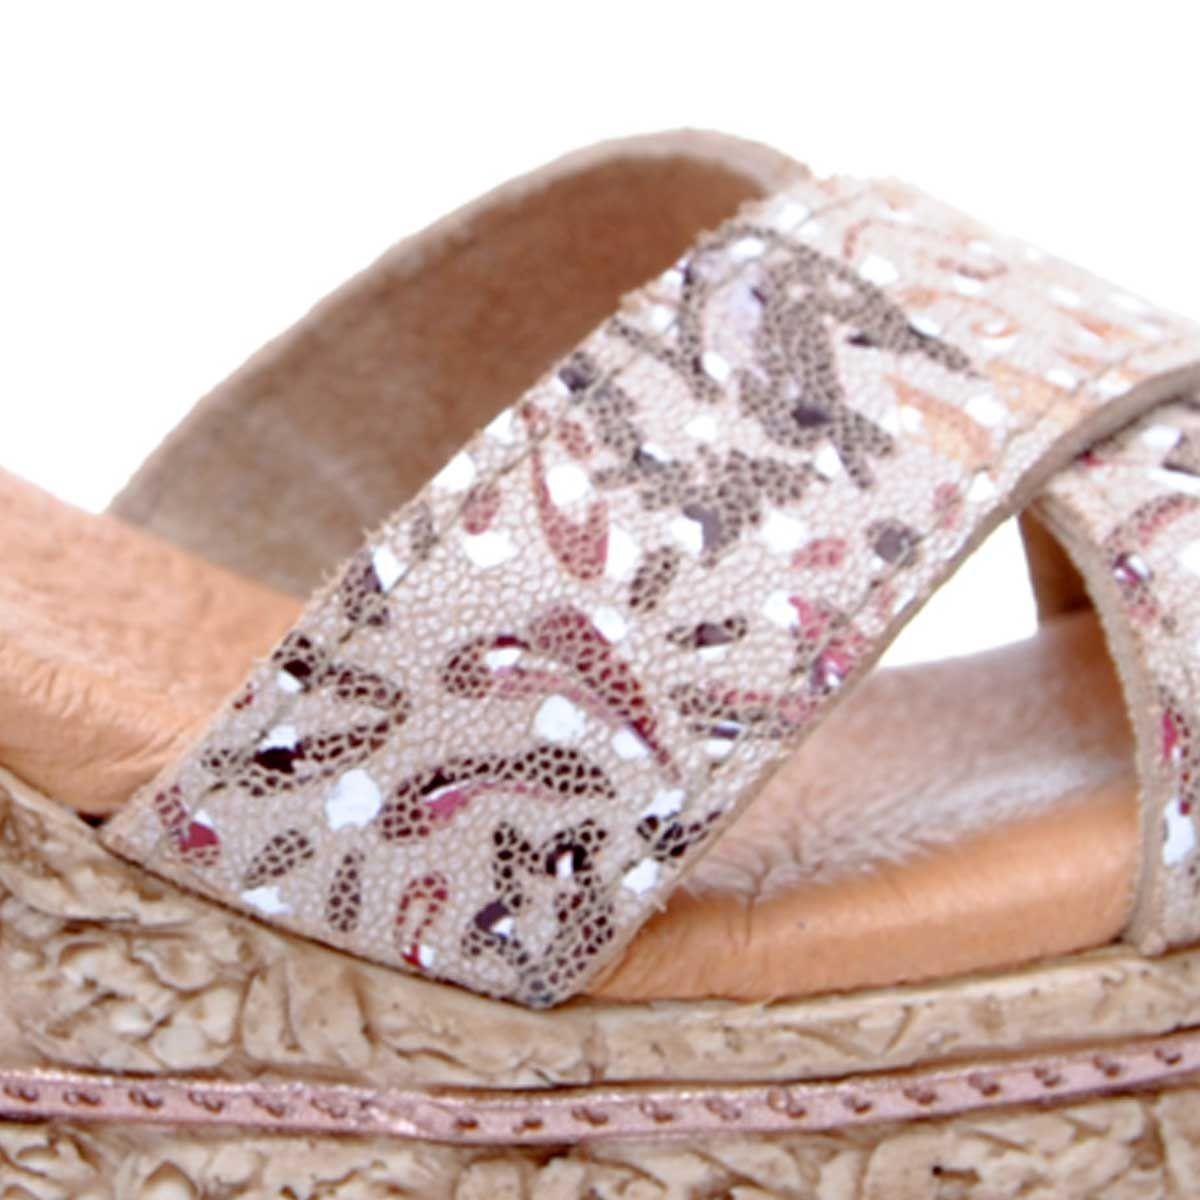 Purapiel Wedge Sandal in Nude